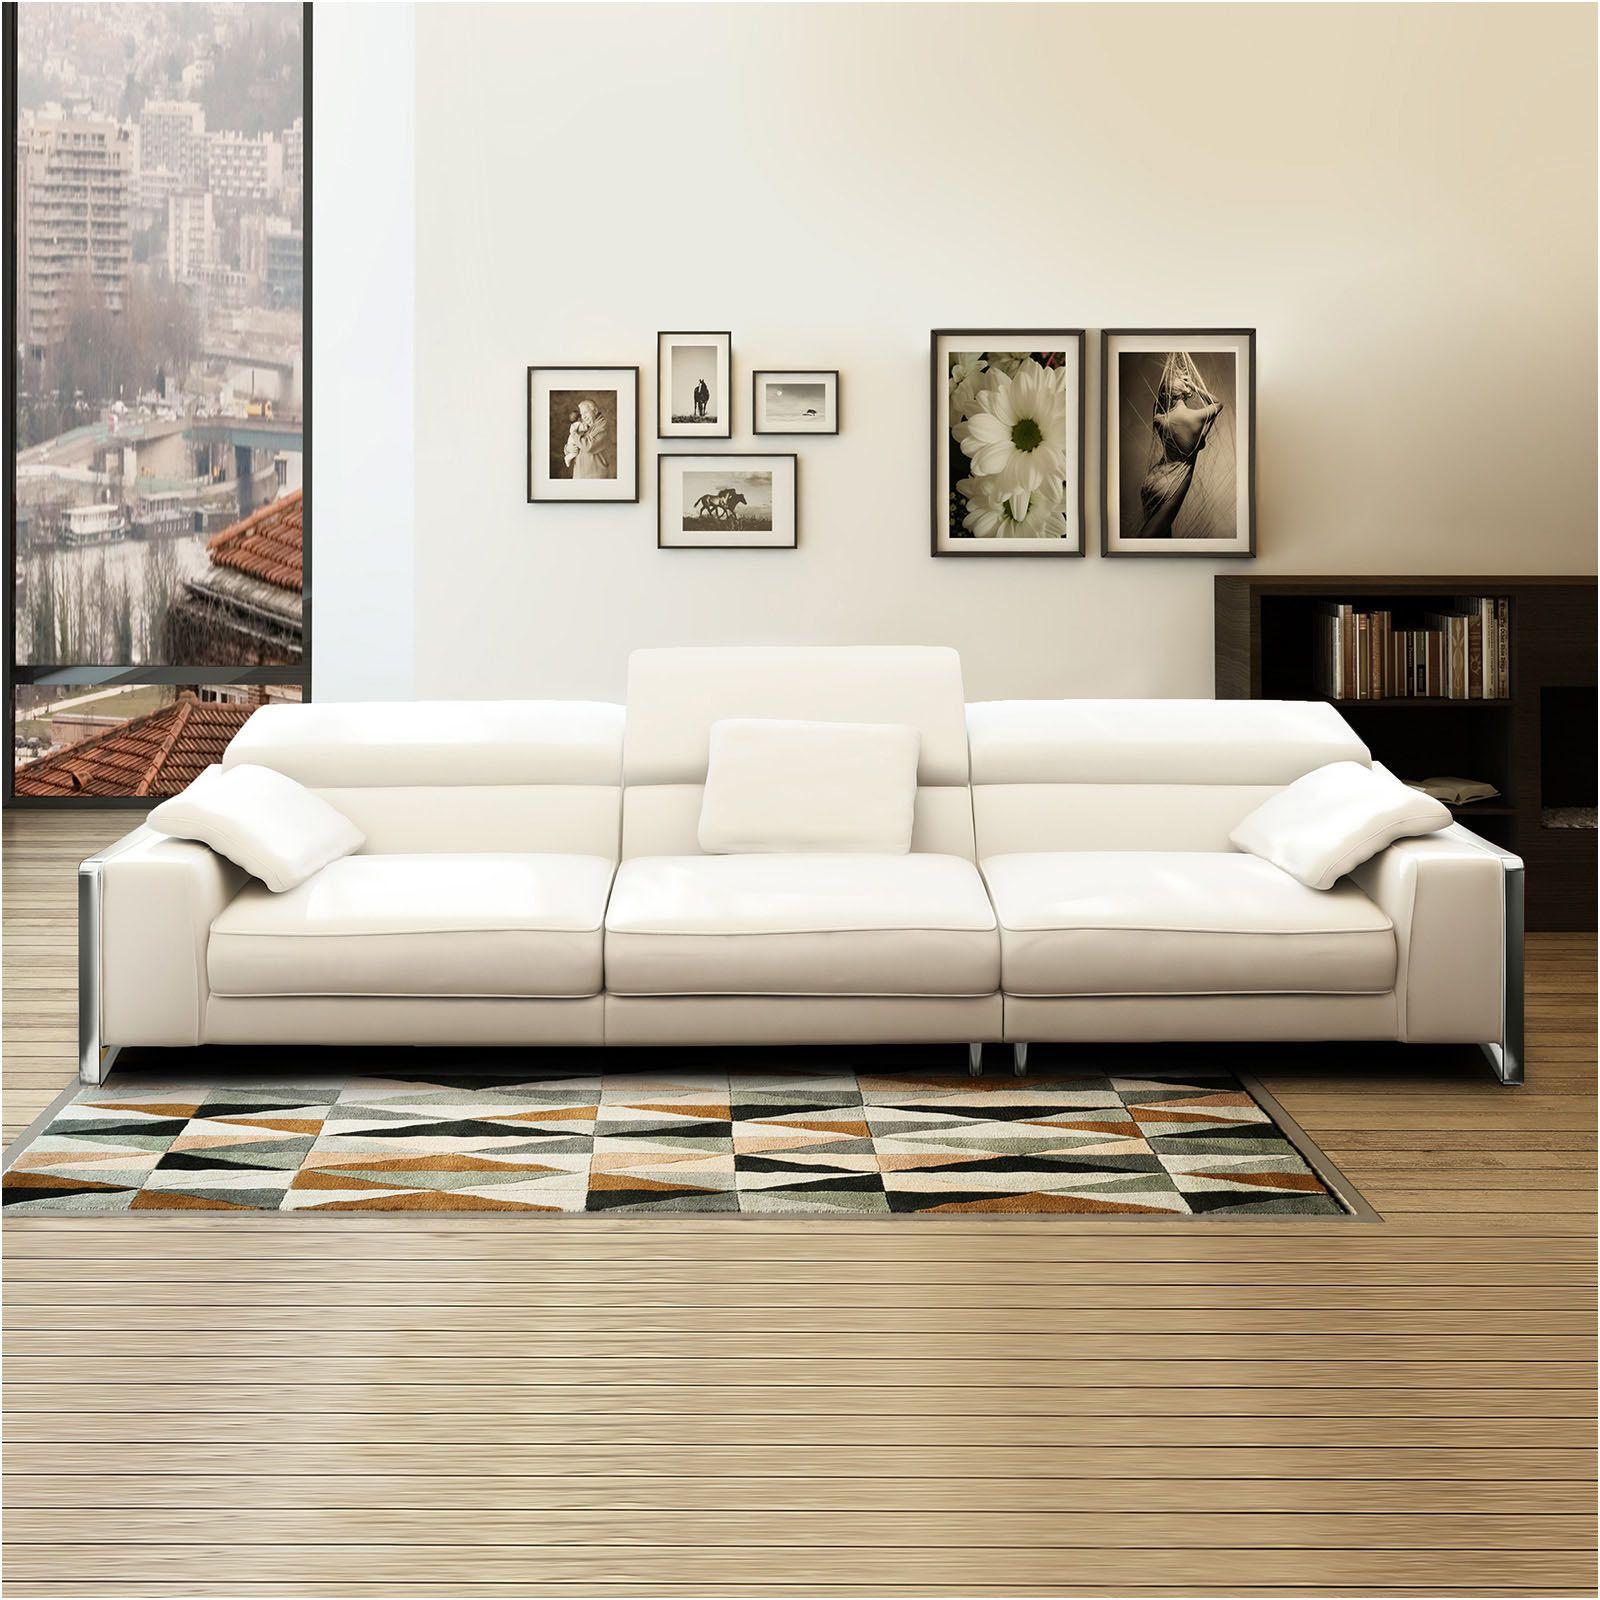 Kreativ Gunstige Couch